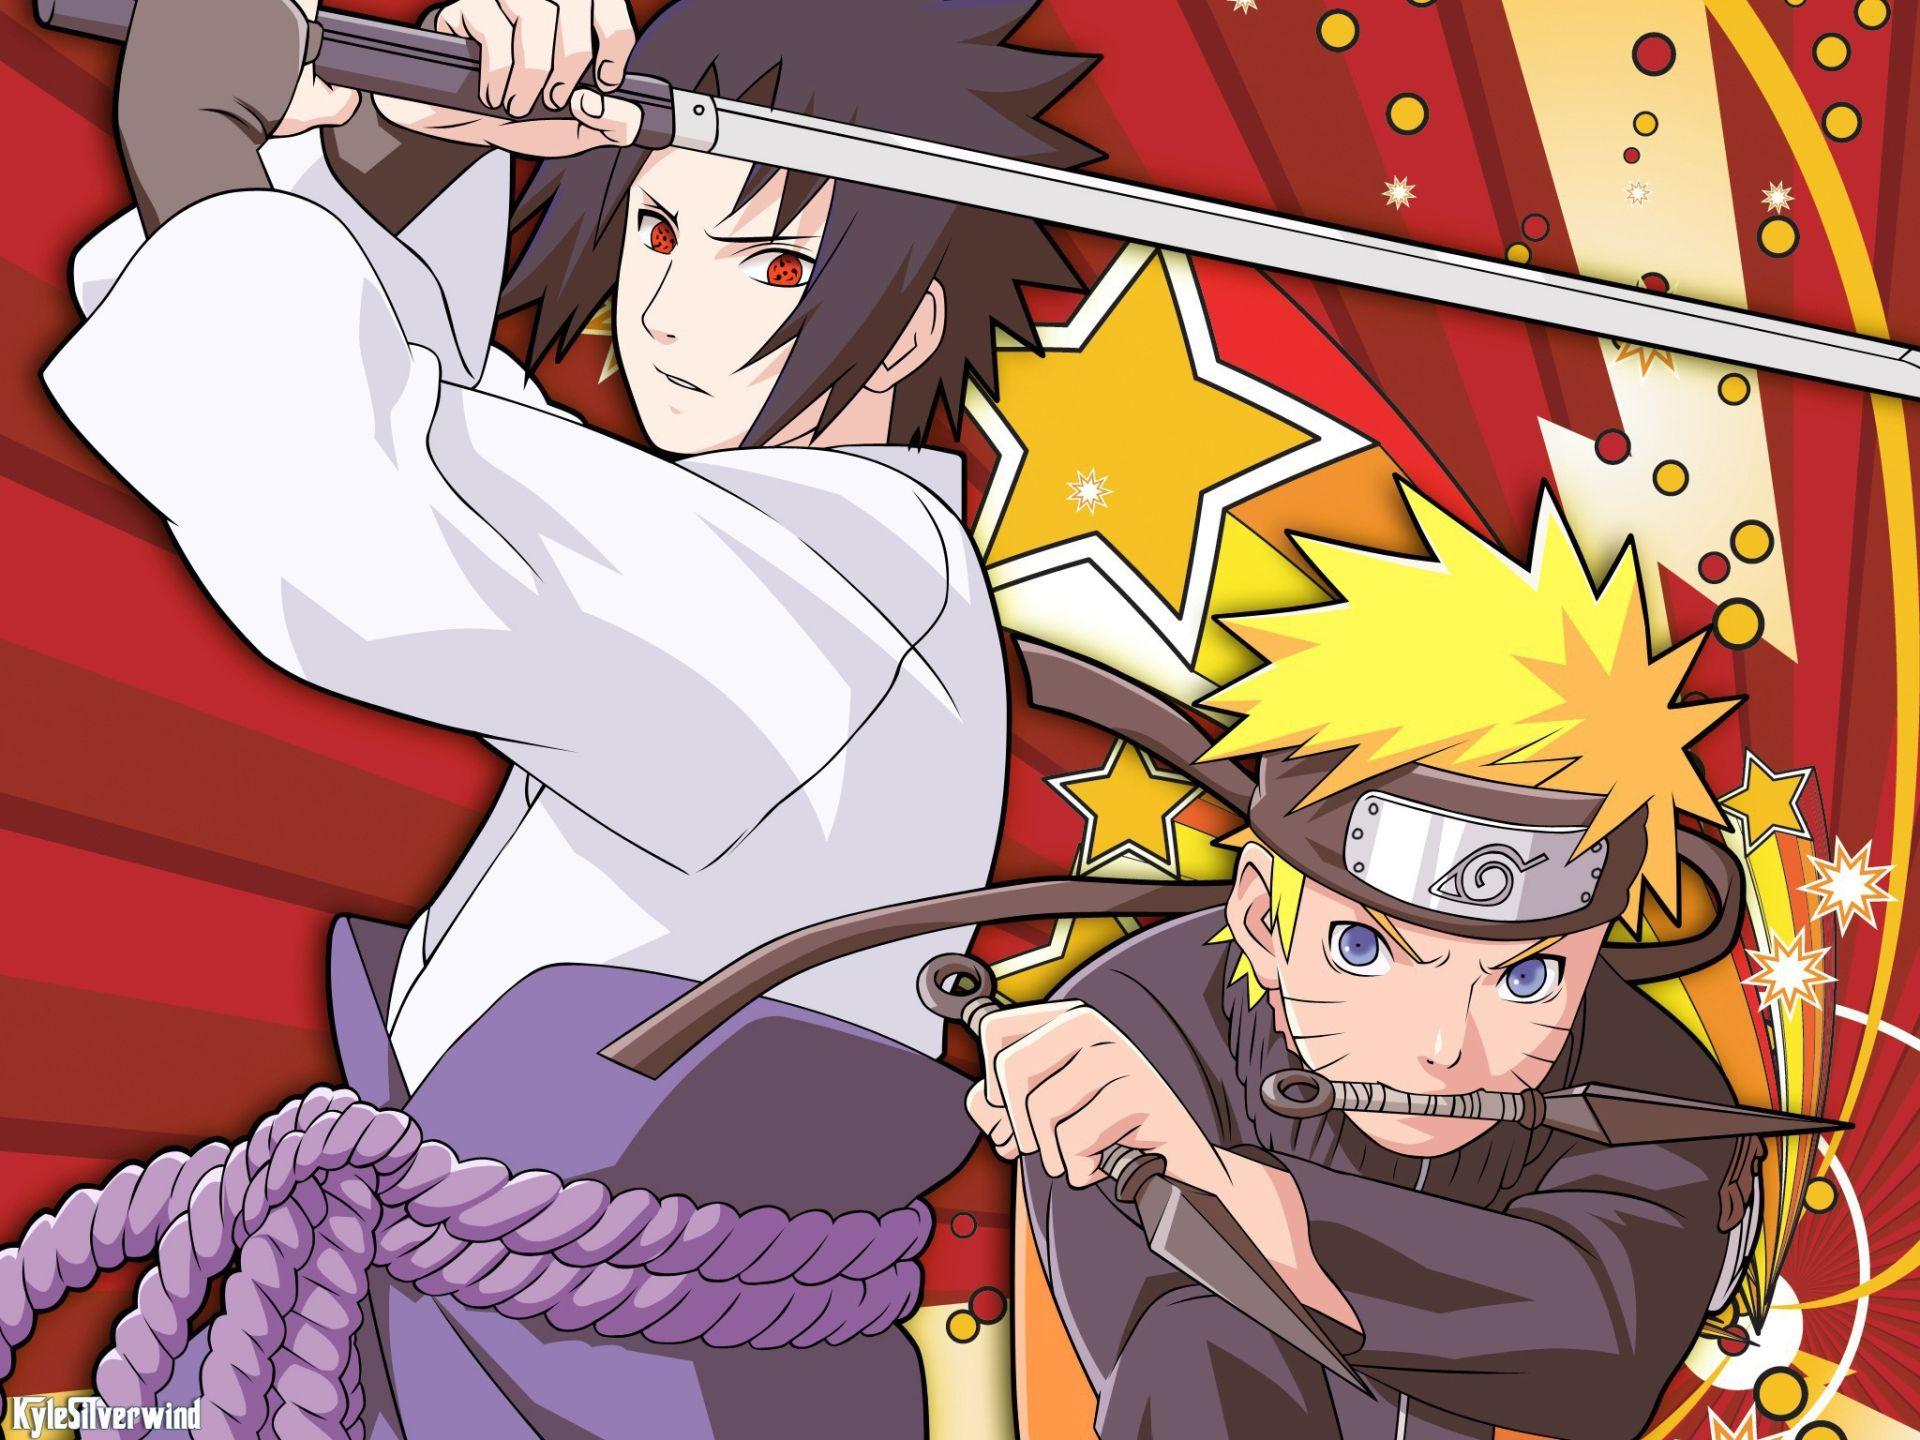 Naruto And Sasuke art, Background